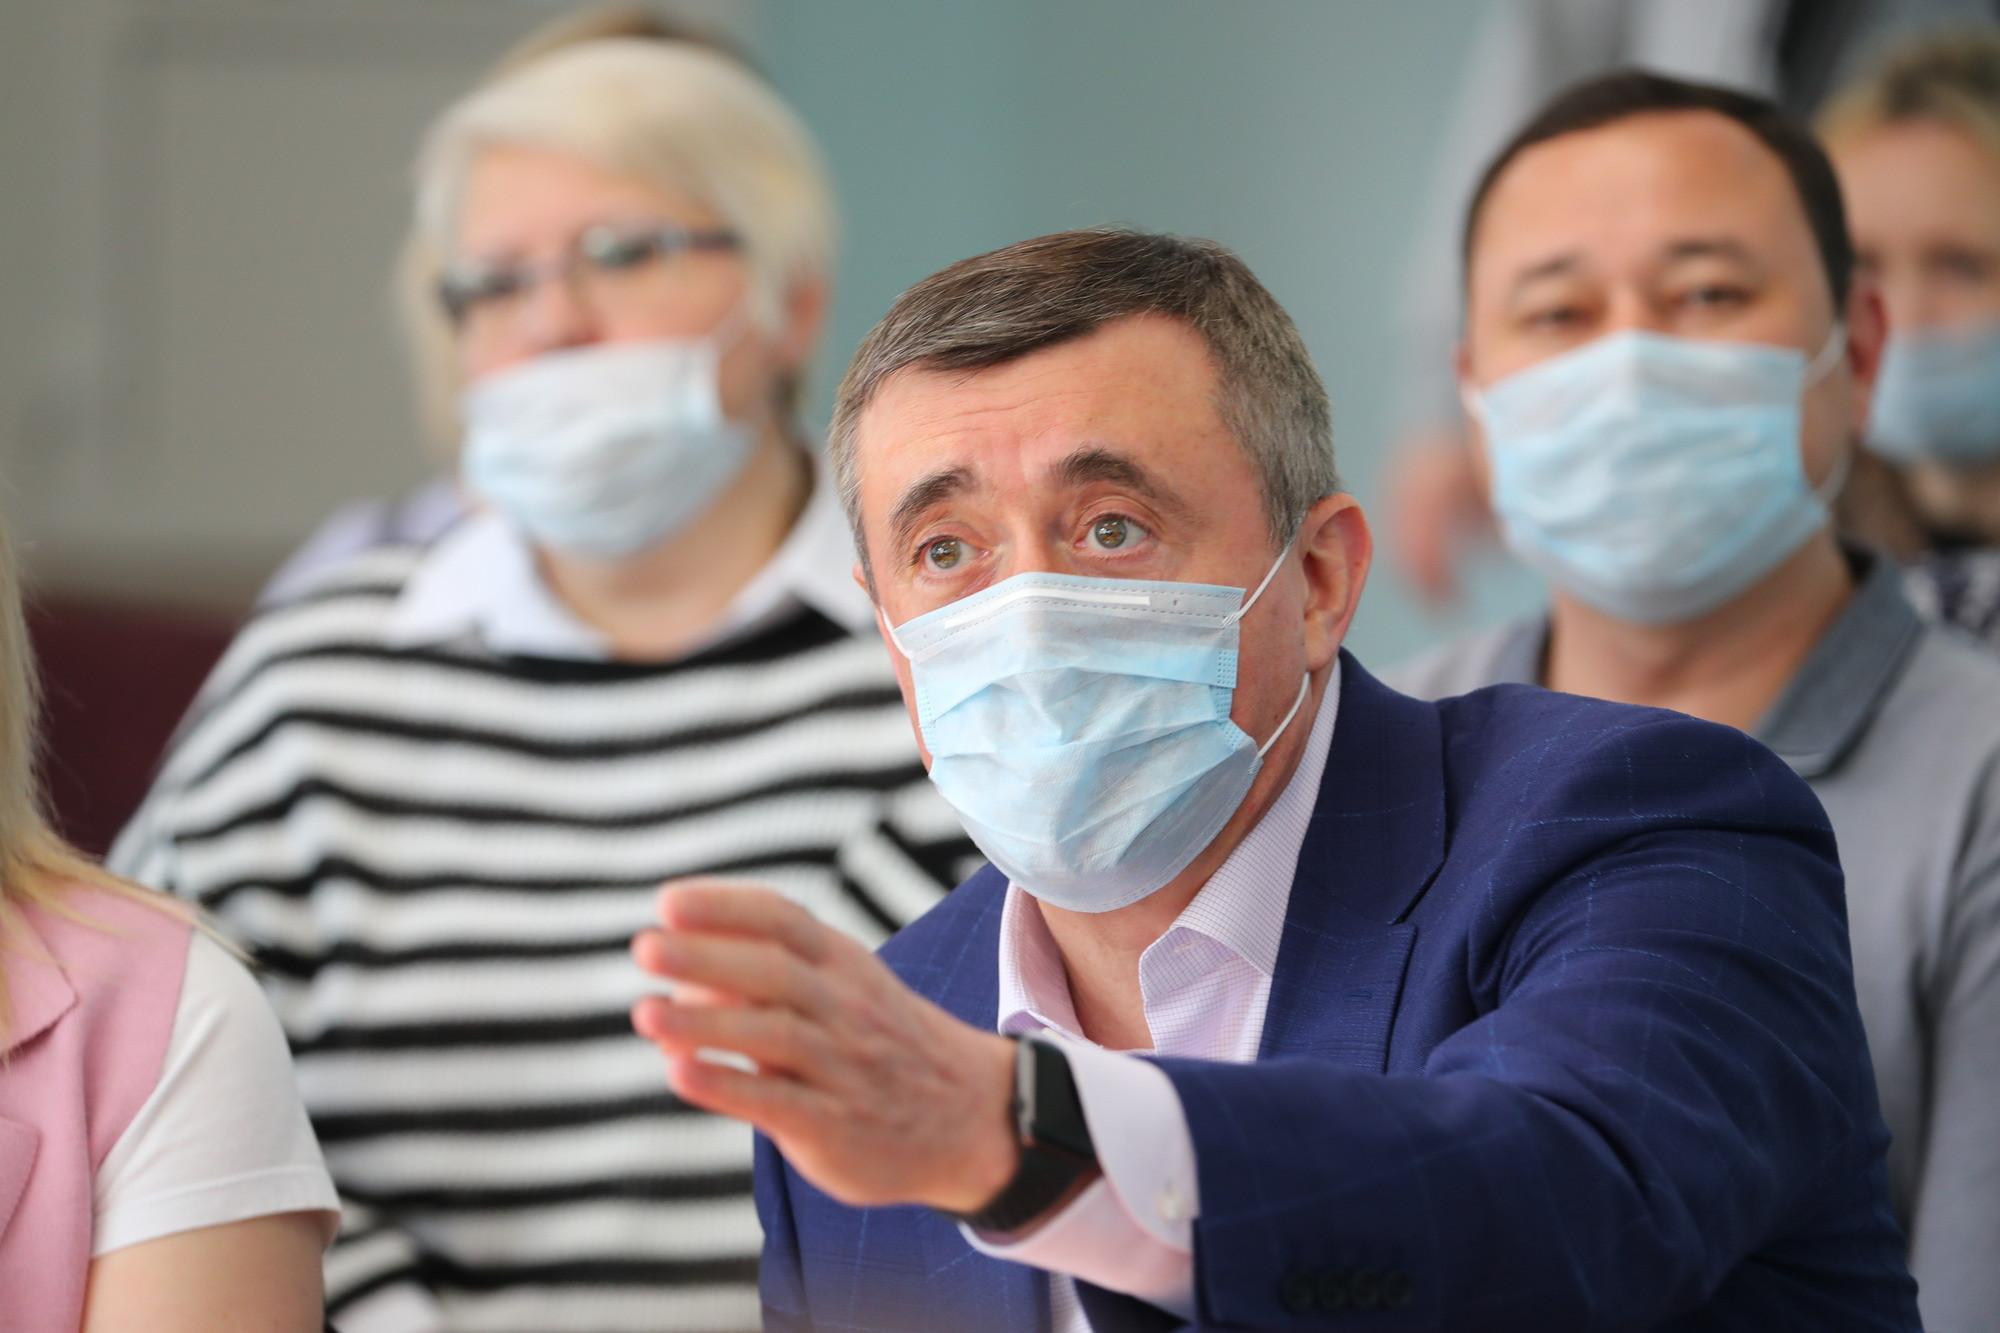 Минздрав не понял инициативу Лимаренко по отмене масочного режима